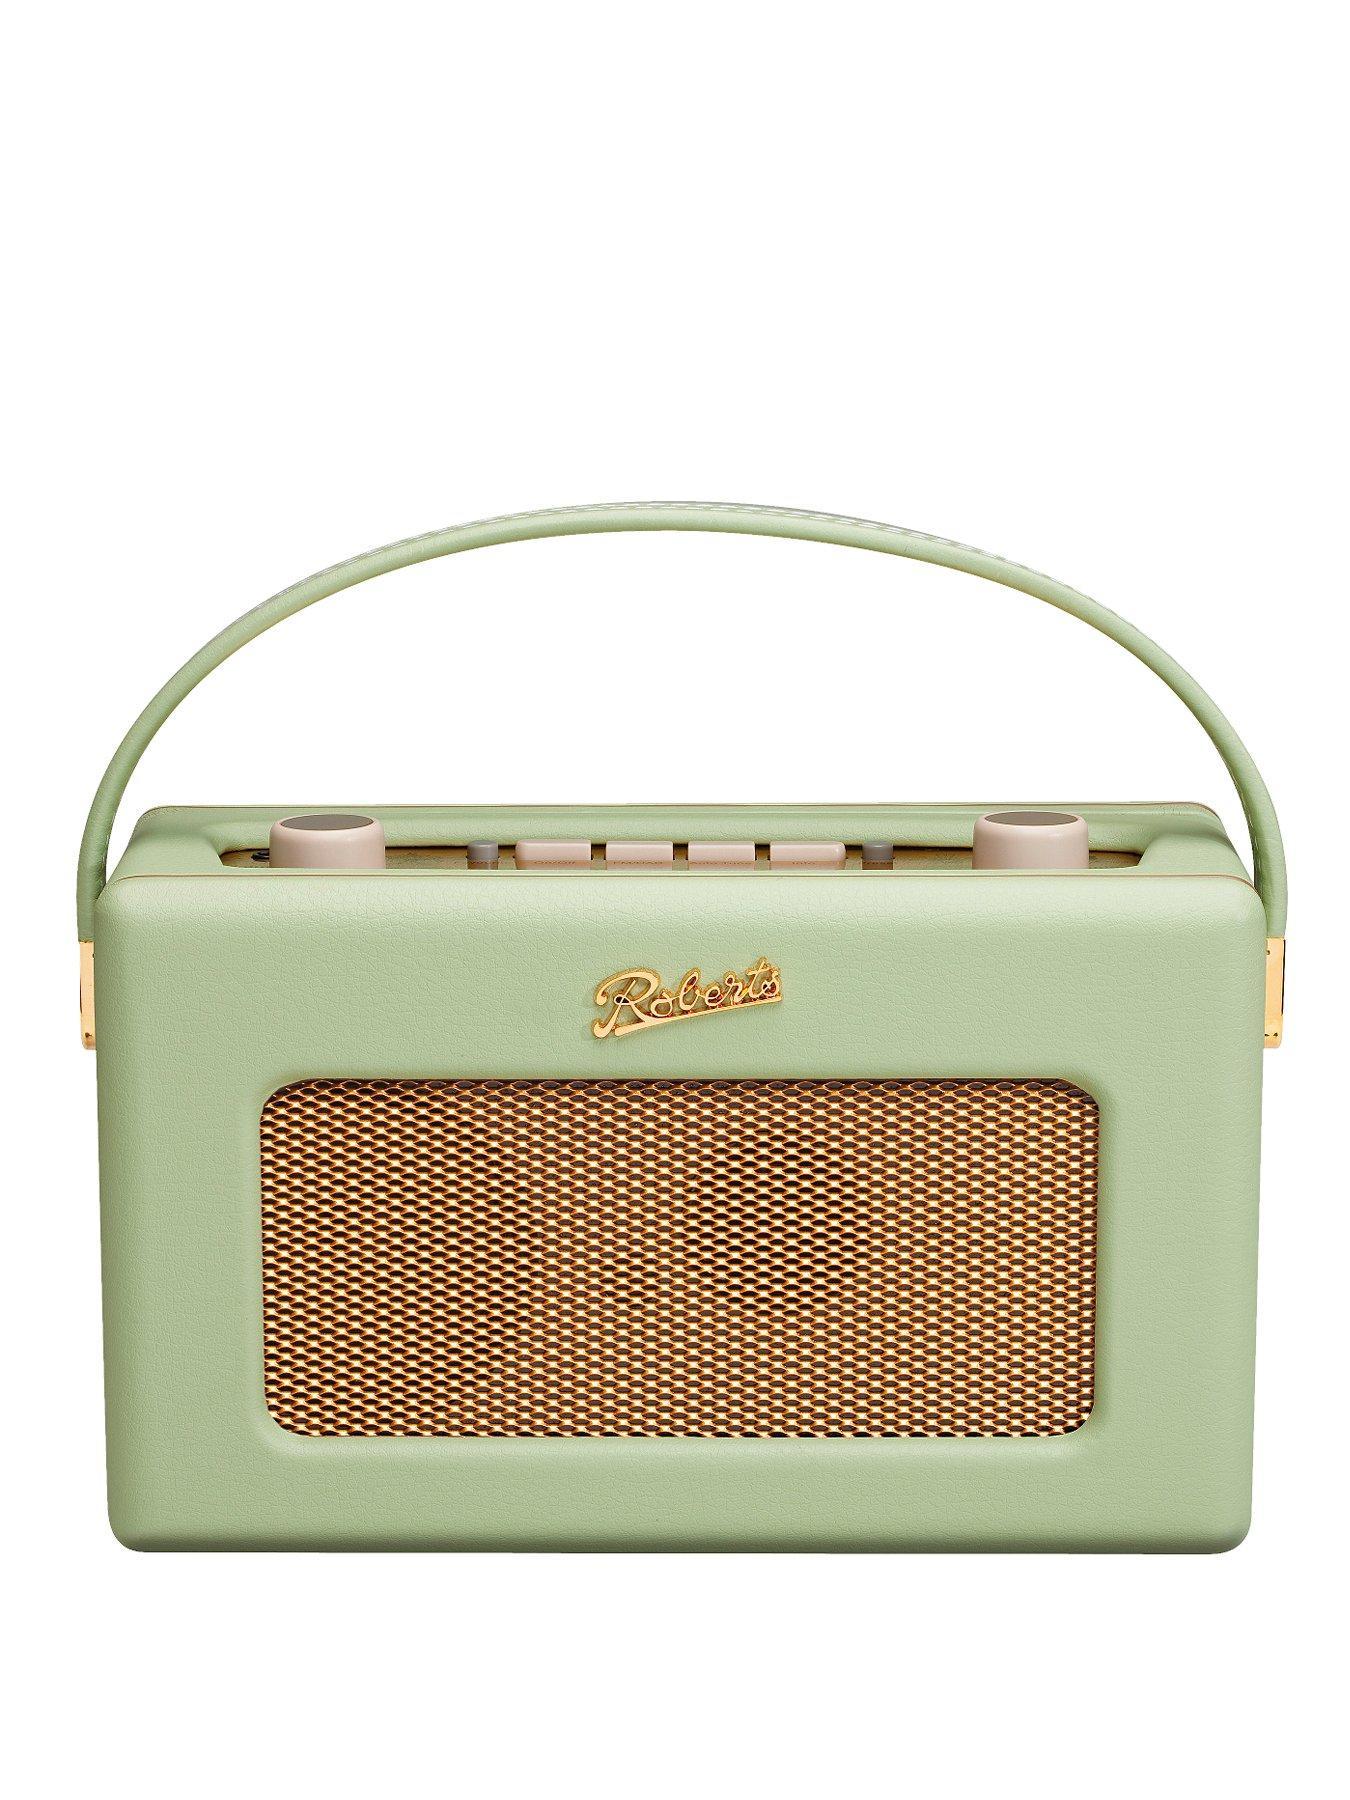 Roberts Revival DAB/FM RDS Digital Radio - Leaf Green